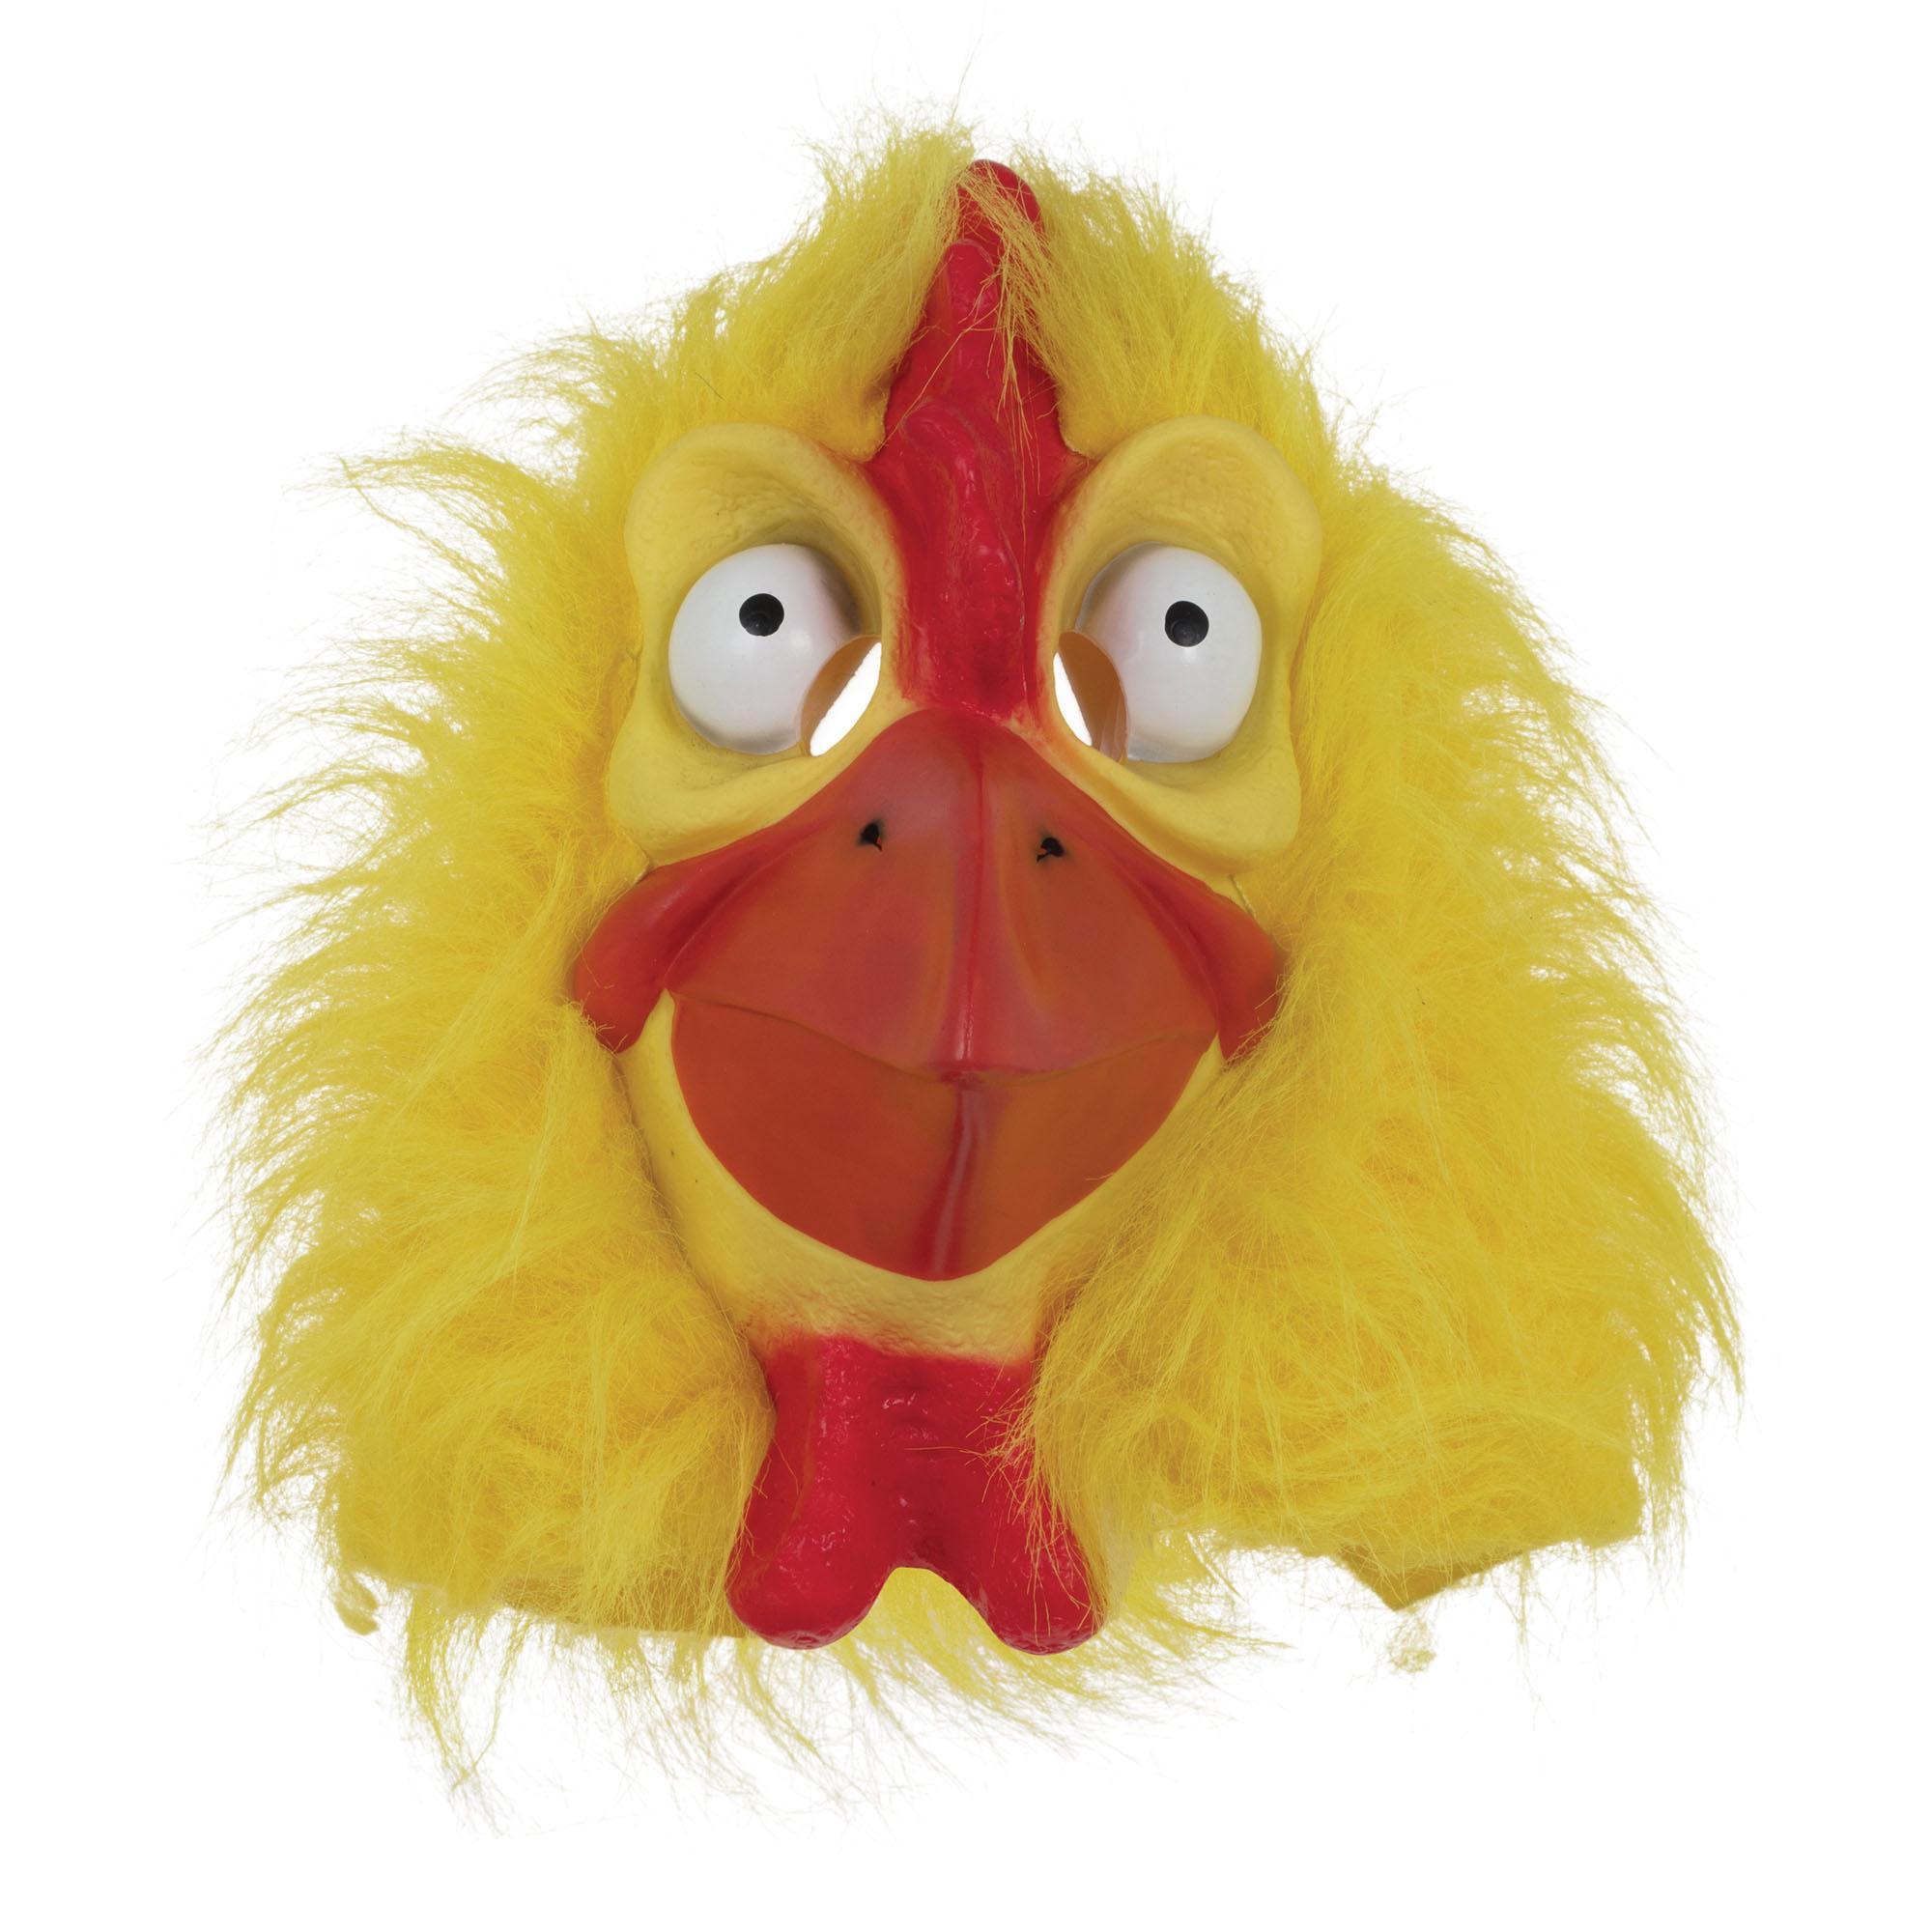 Chicken Mask Yellow Fur Animal Easter Fancy Dress Costume Mask | eBay